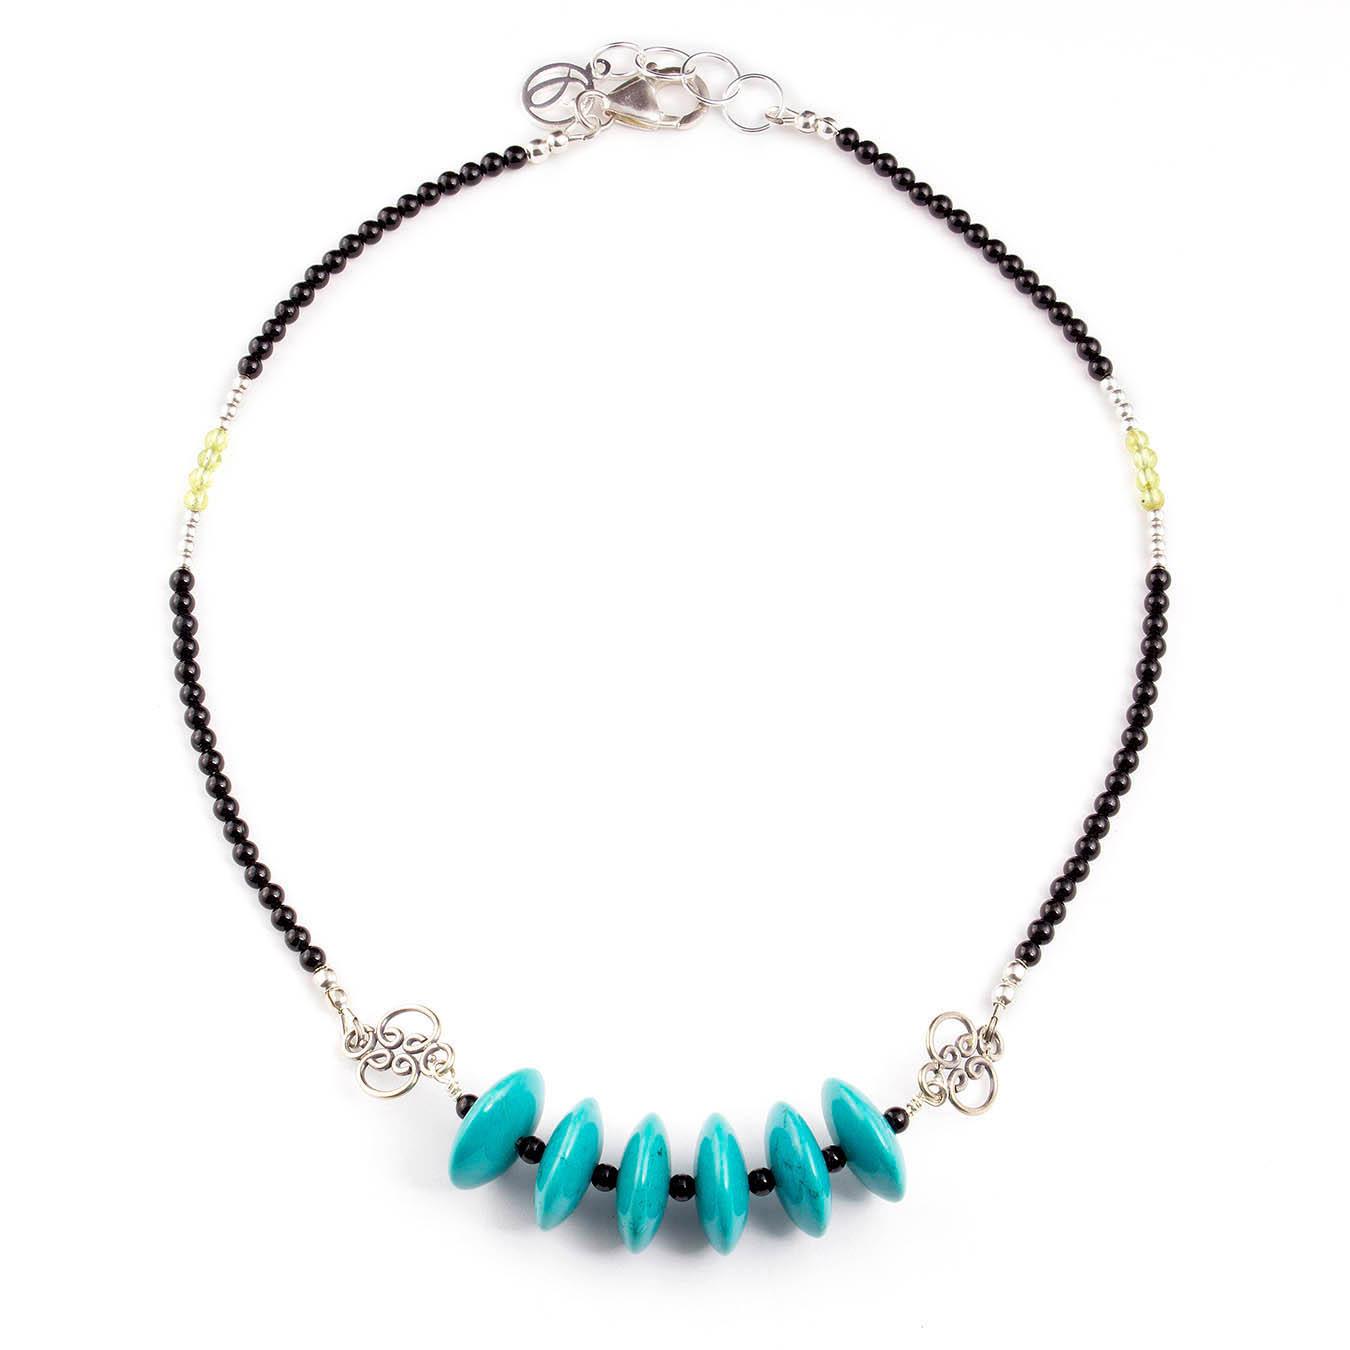 Handmade birthstone jewelry made of turquoise, peridot and bali